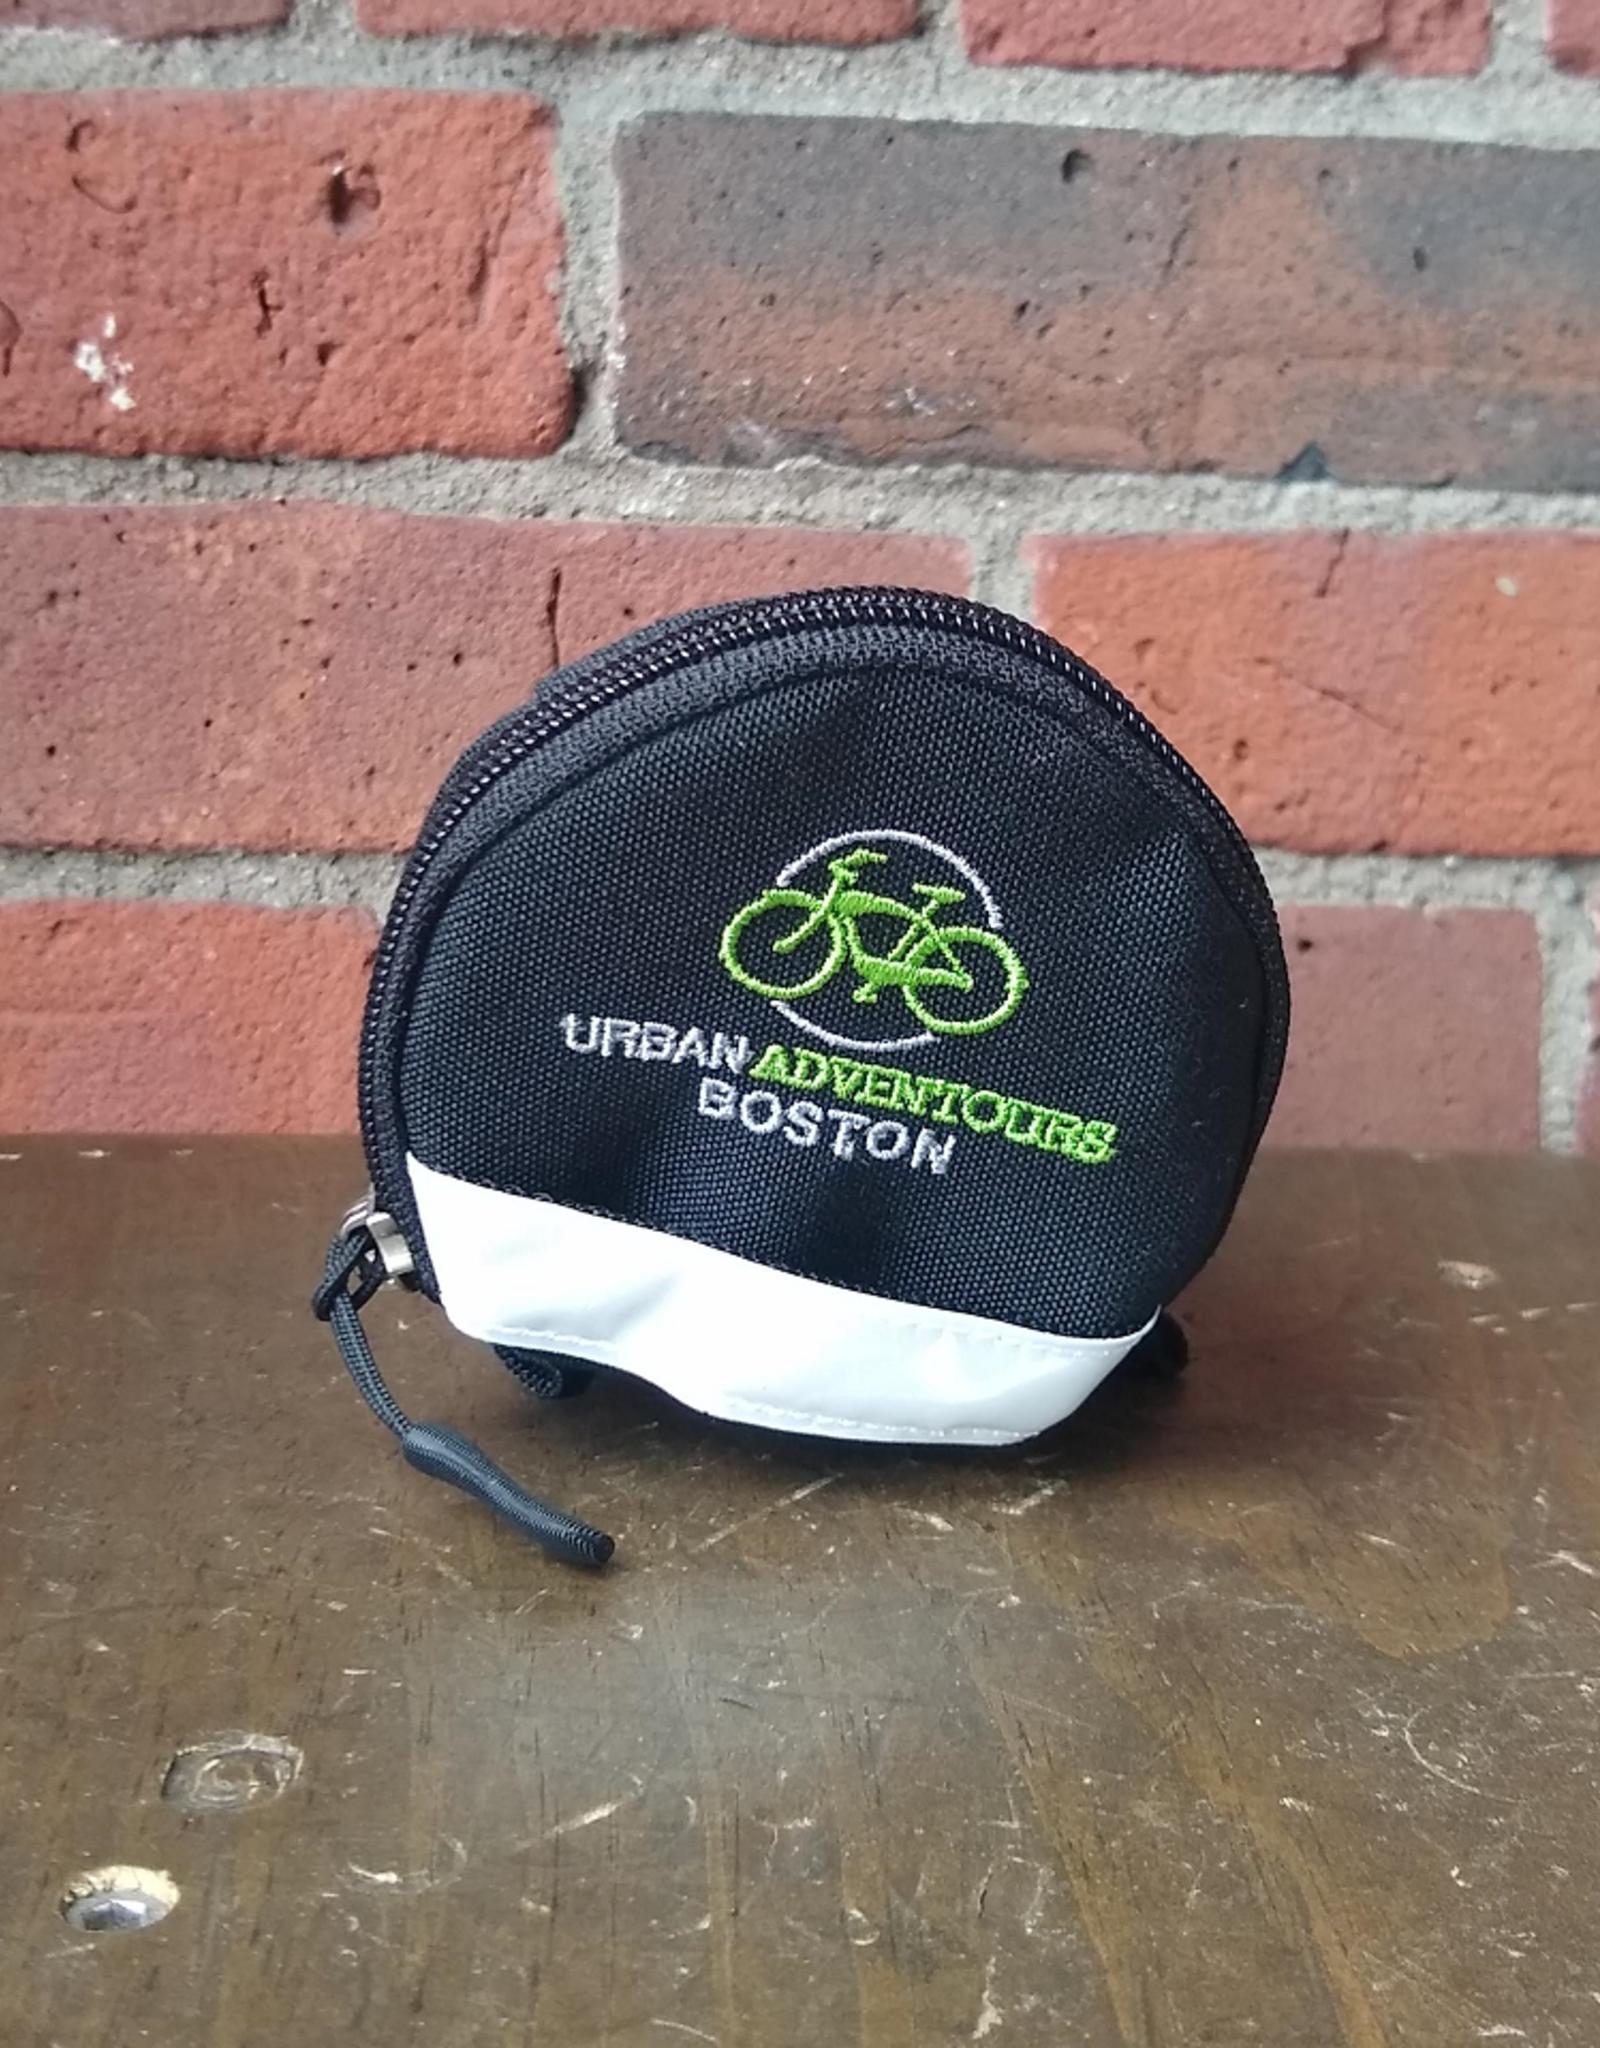 Accessory - UA Custom Mini Cargo Seat Wedge Bag 2.25oz